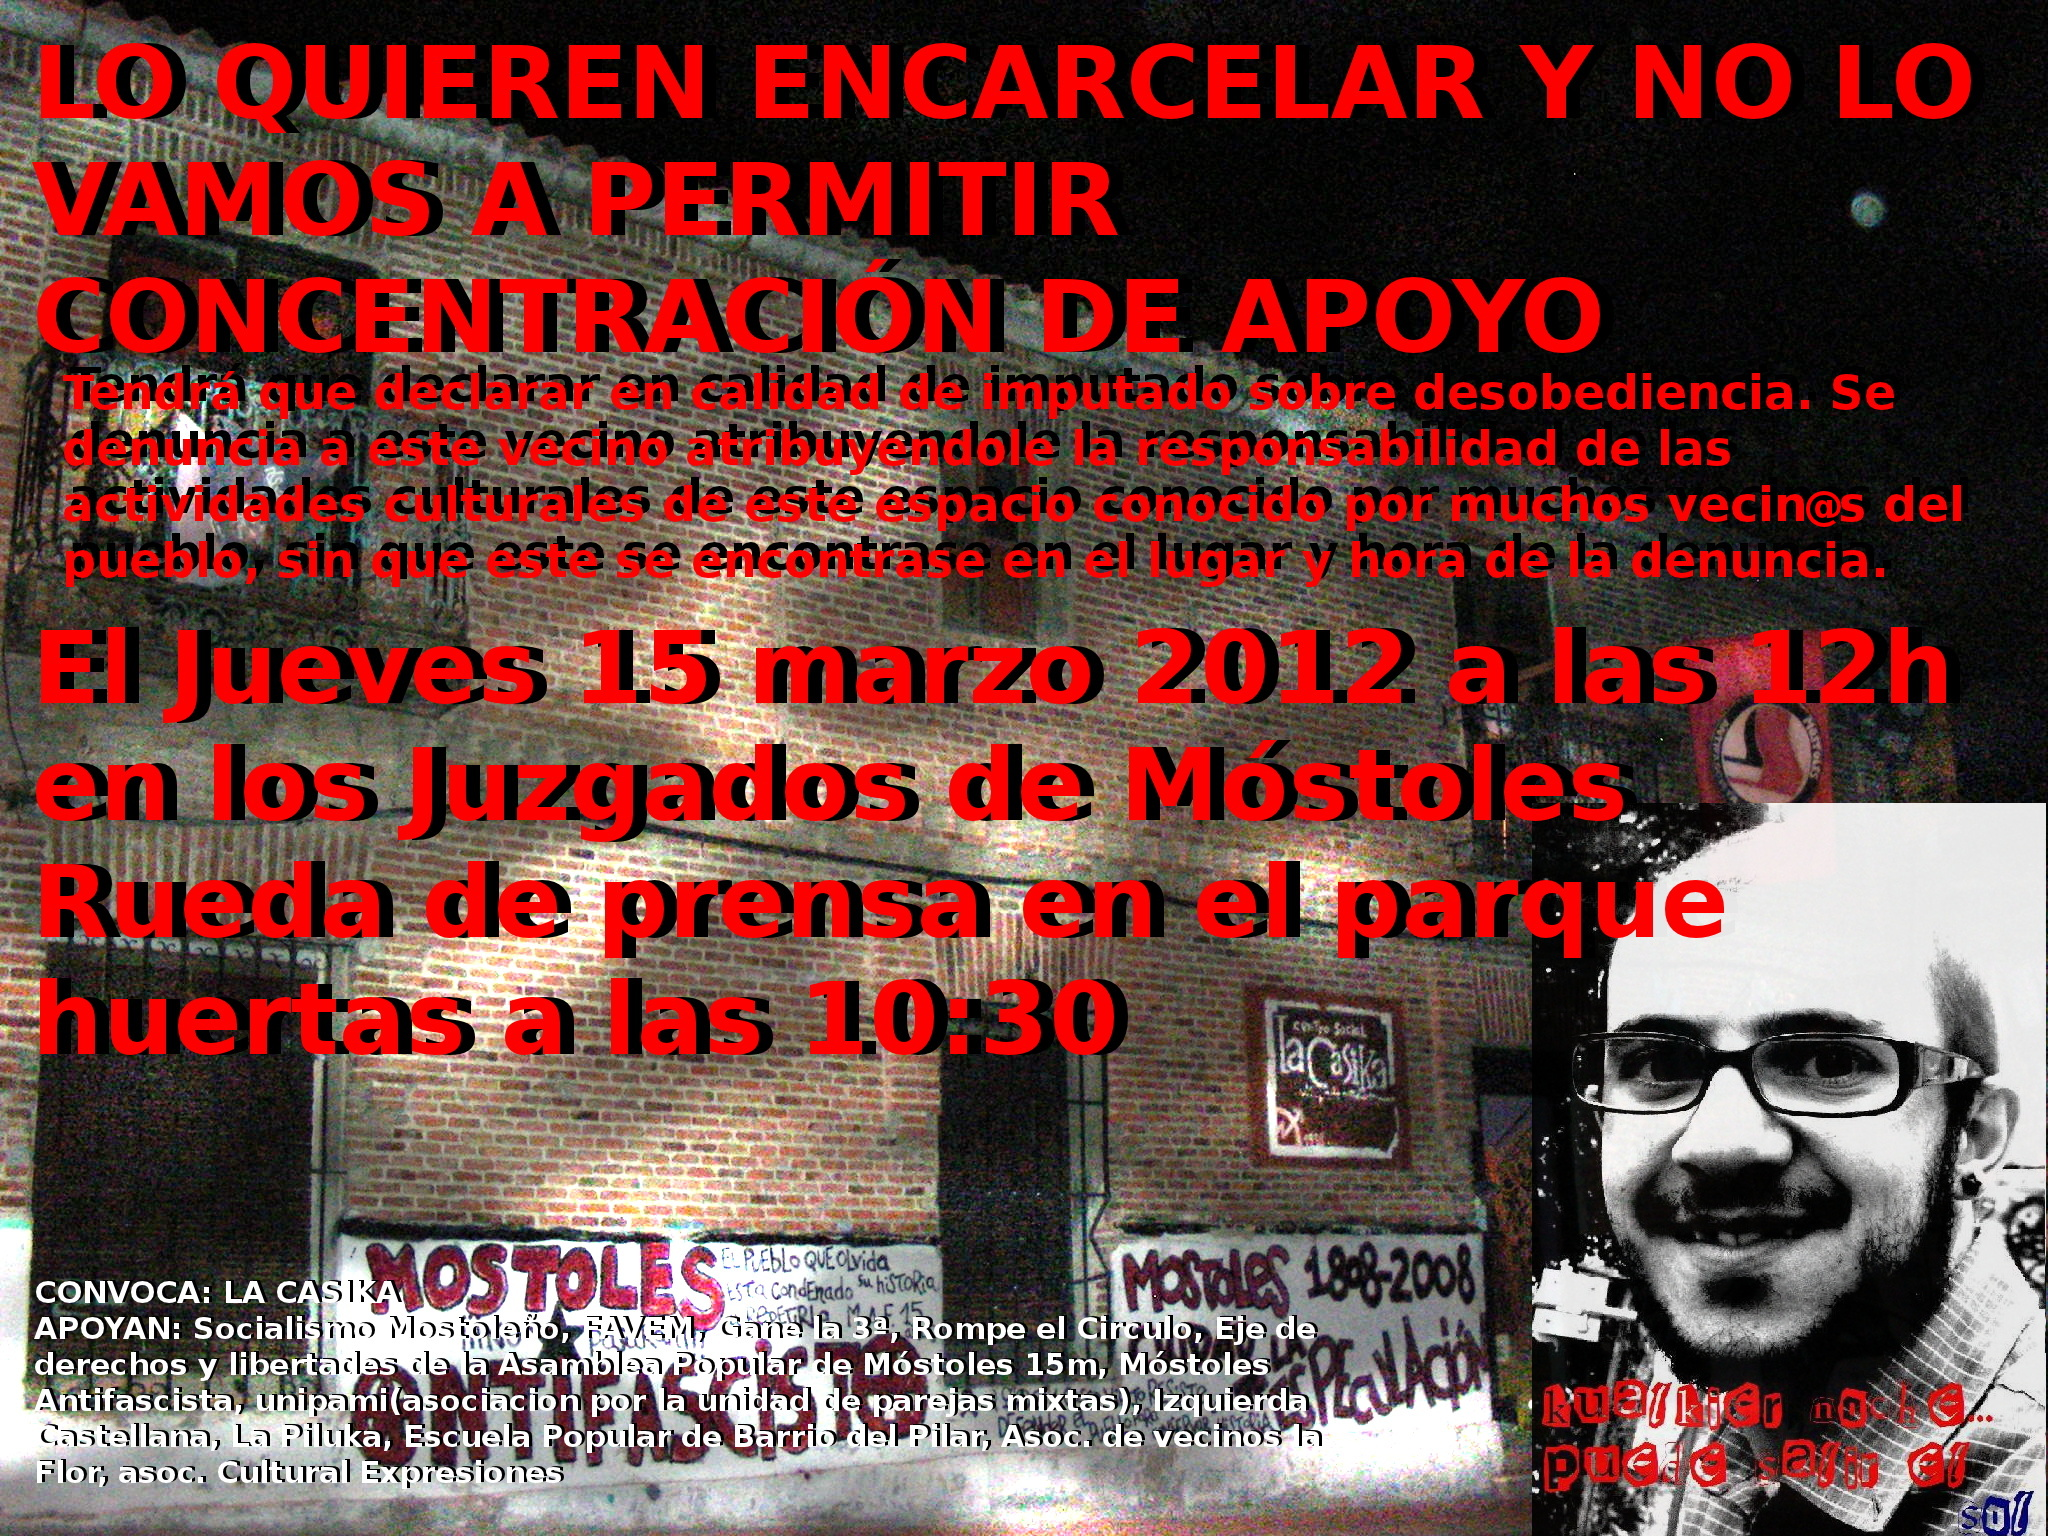 http://encrucijadaalcorcon.files.wordpress.com/2012/02/concentracion-moiche.jpg